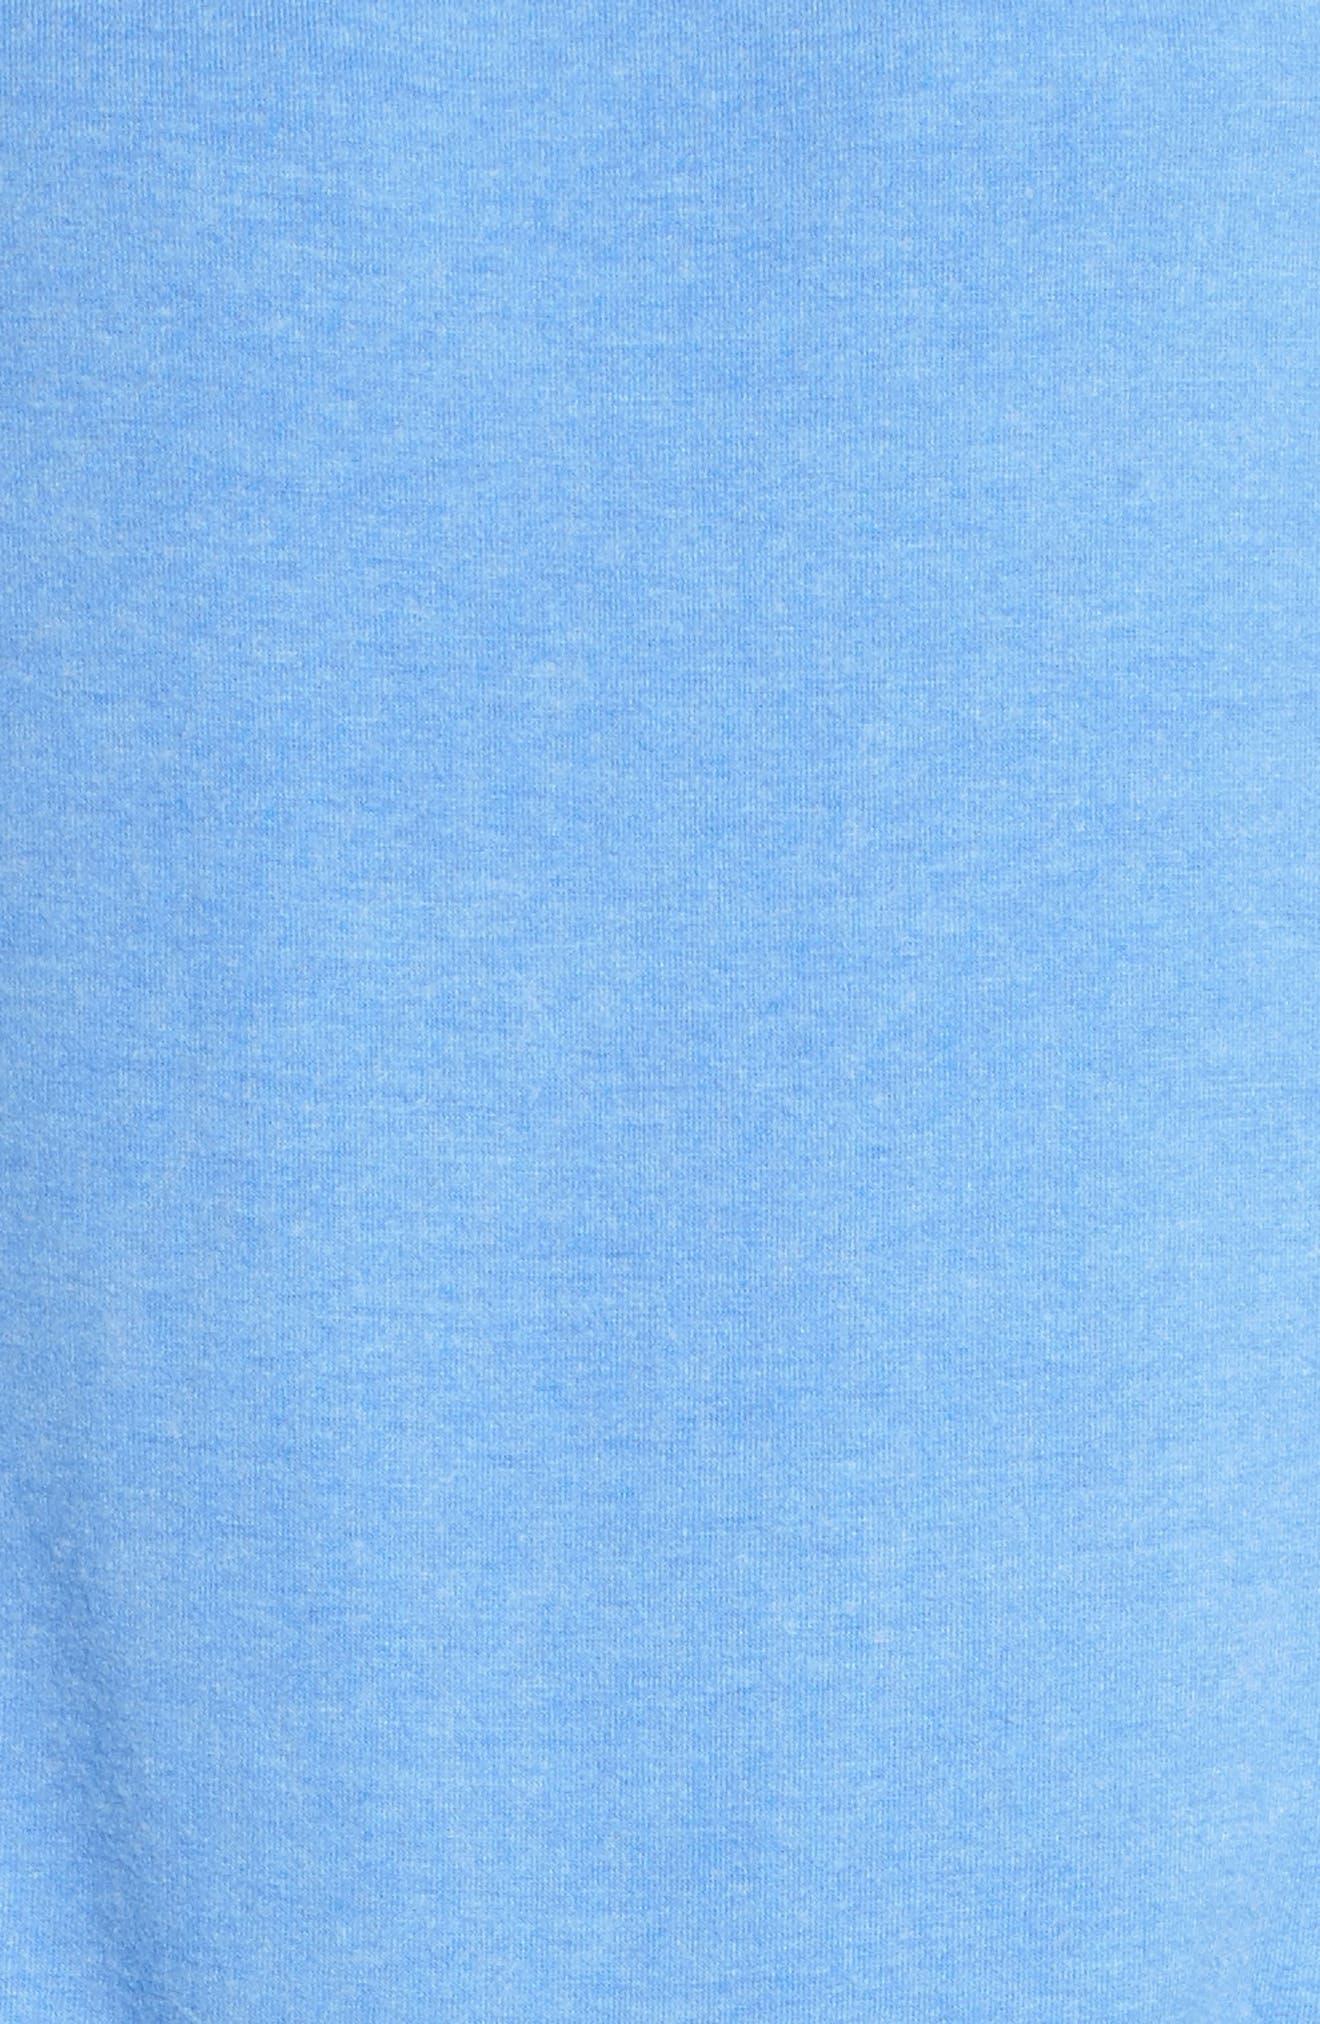 Cloud 9 Pajamas,                             Alternate thumbnail 6, color,                             Blue Azurite